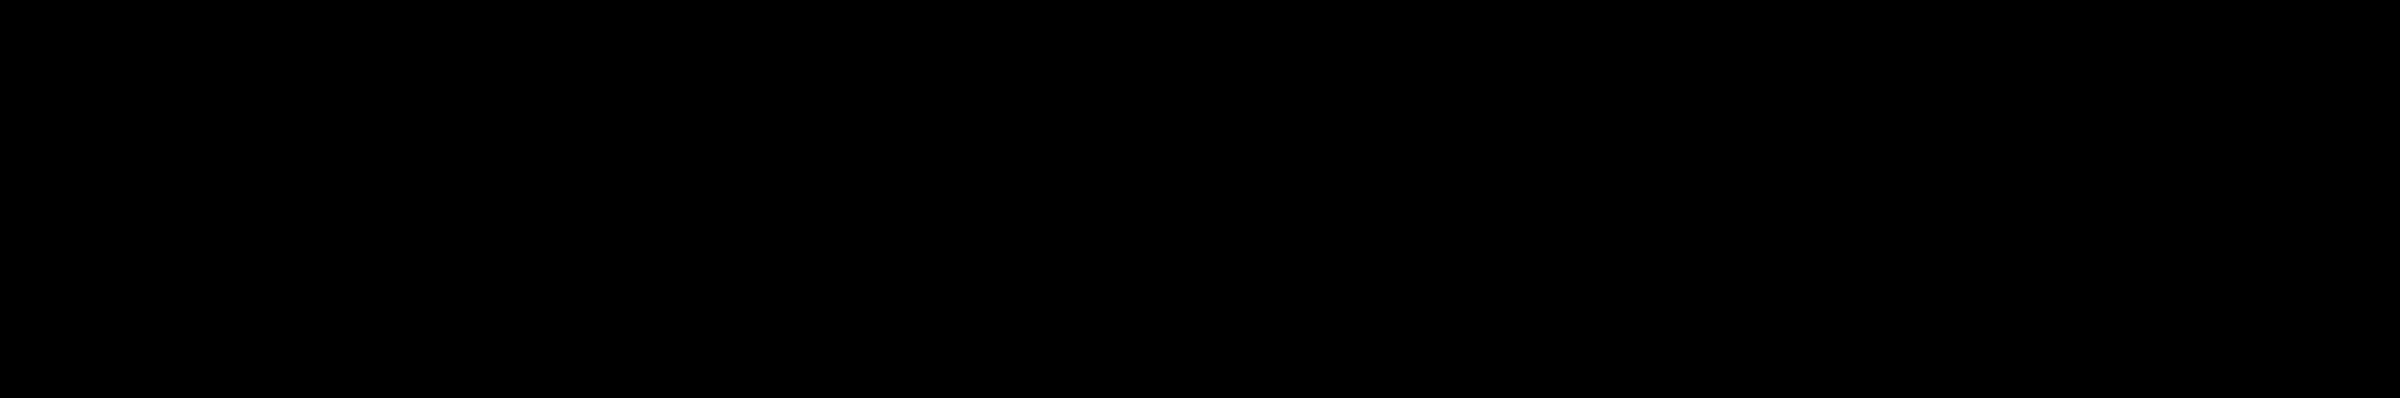 Geely Sma manufacturer logo